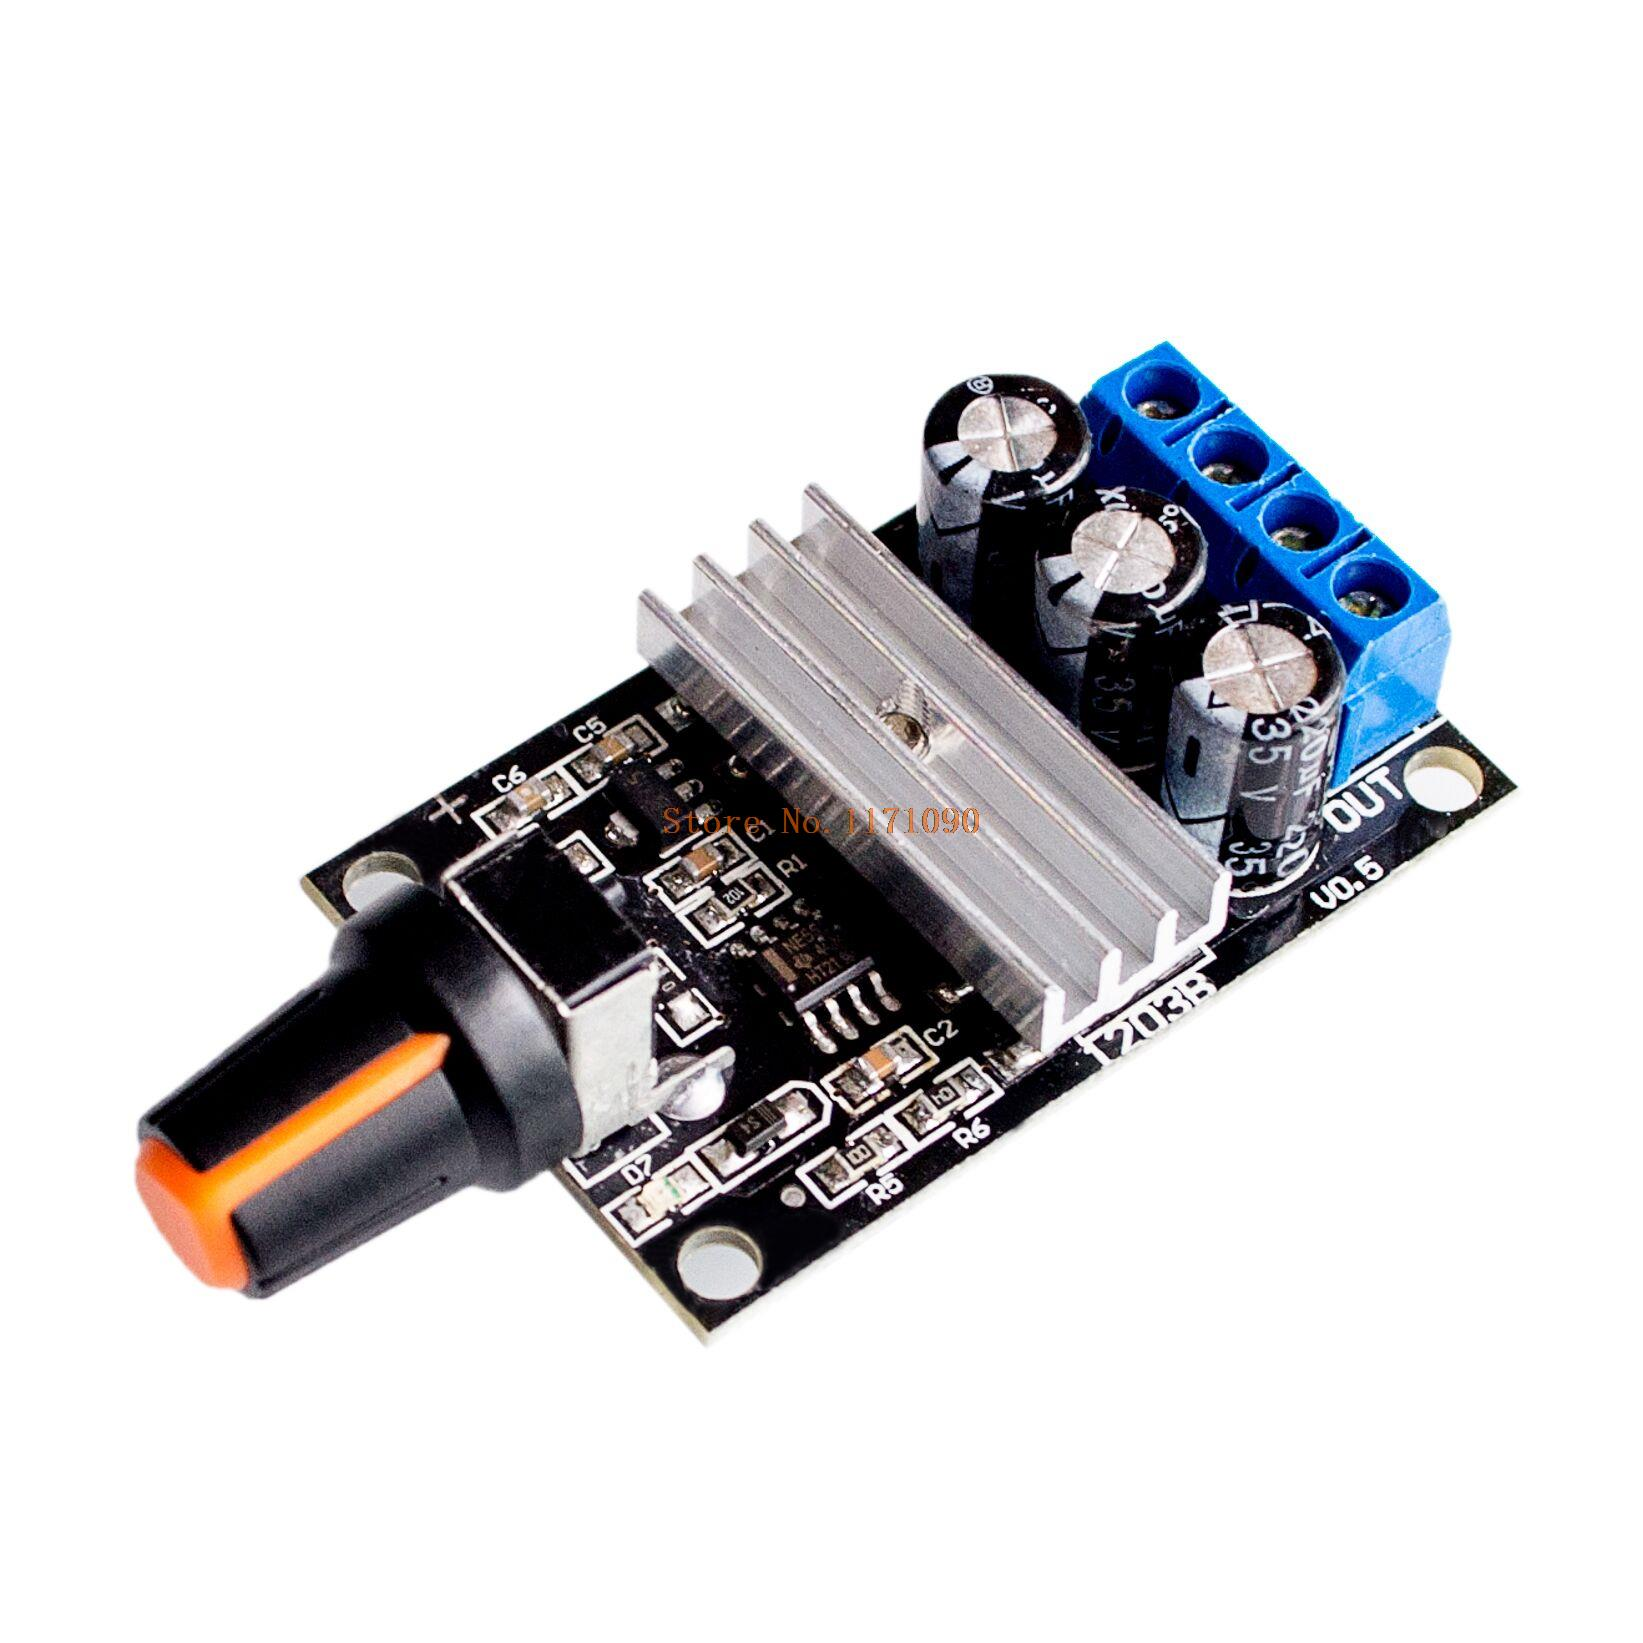 Pwm dc 6v 12v 24v 28v 3a motor speed control new switch for 24v dc motor controller circuit